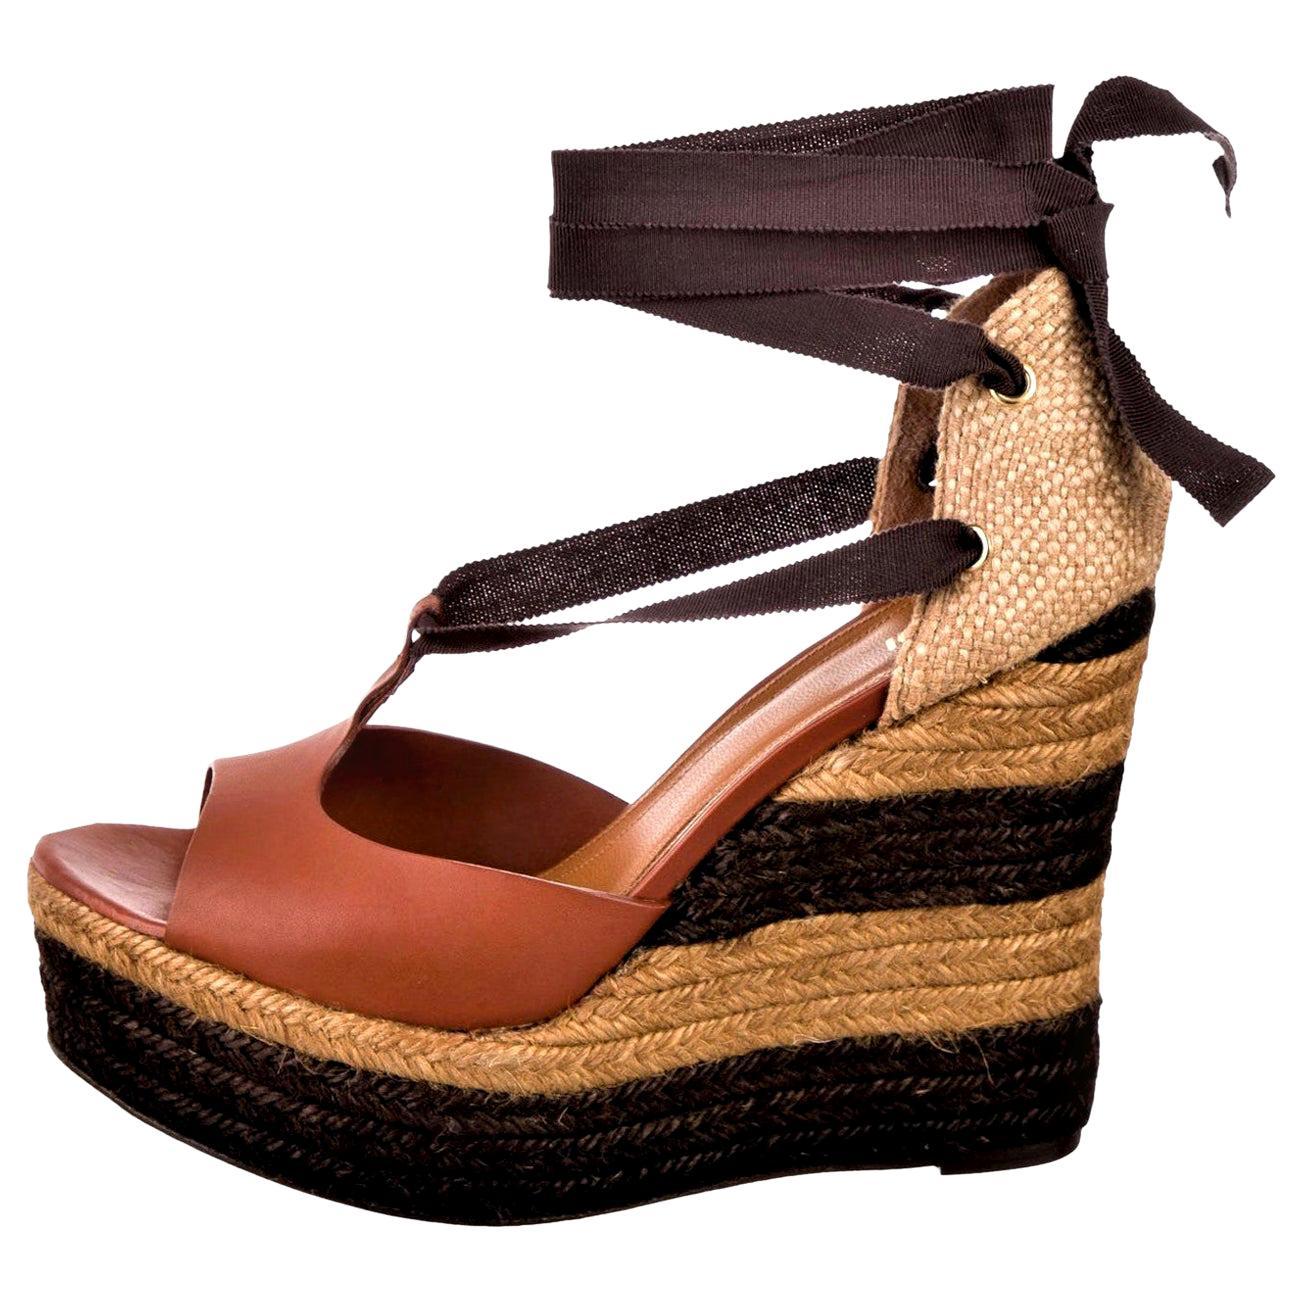 New Fendi Karl Lagerfeld Runway Ad Leather Platform Wedge Heels Sandals Sz 40.5